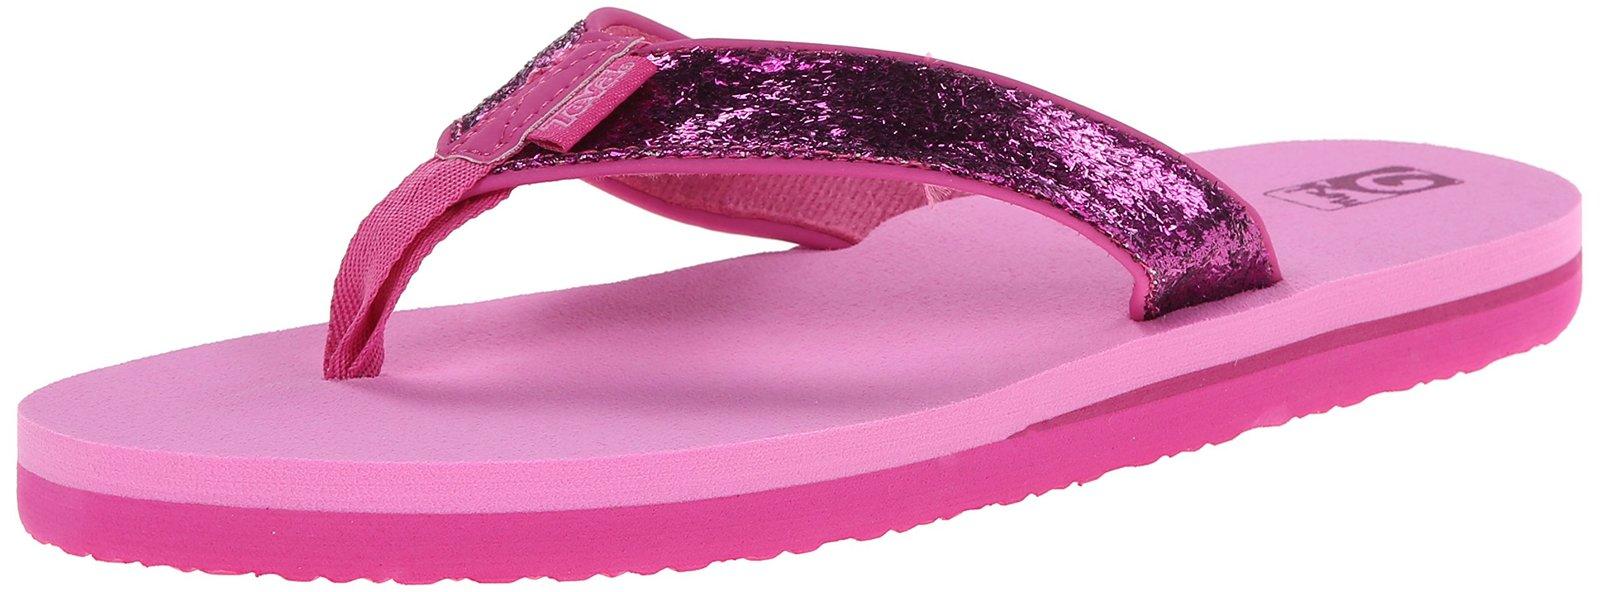 7c1d586beeee8 Teva Mush II Kids Flip Flop Sandal (Little and 21 similar items. 81uf9ddxocl